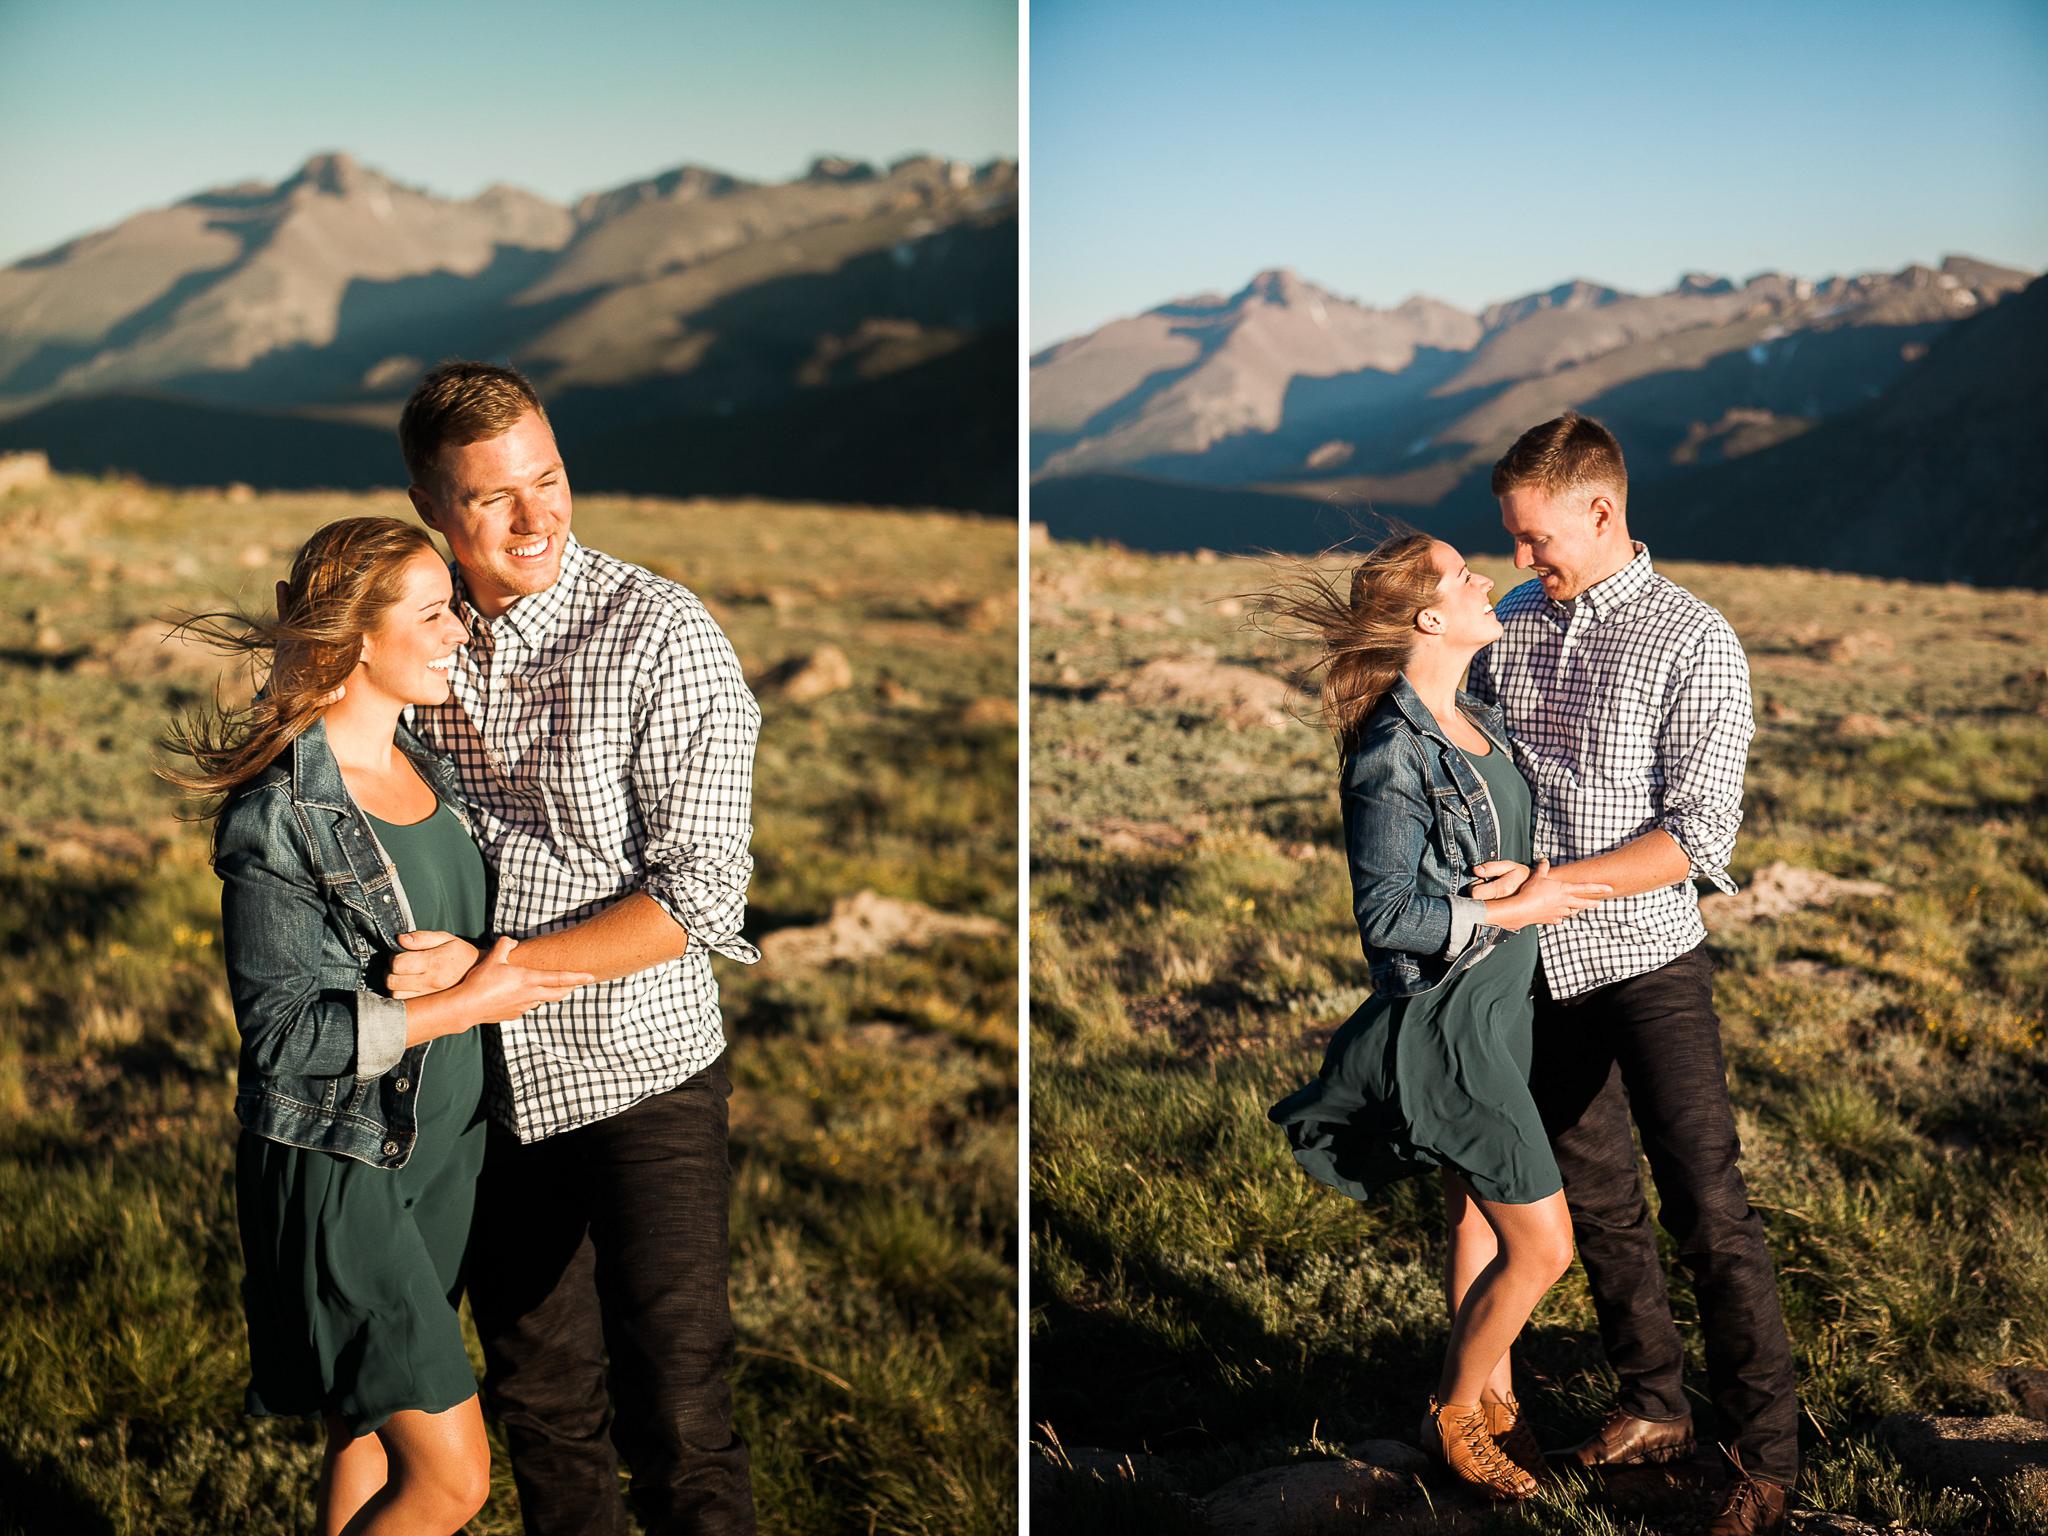 Rocky-Mountain-National-Park-engagement_025.jpg